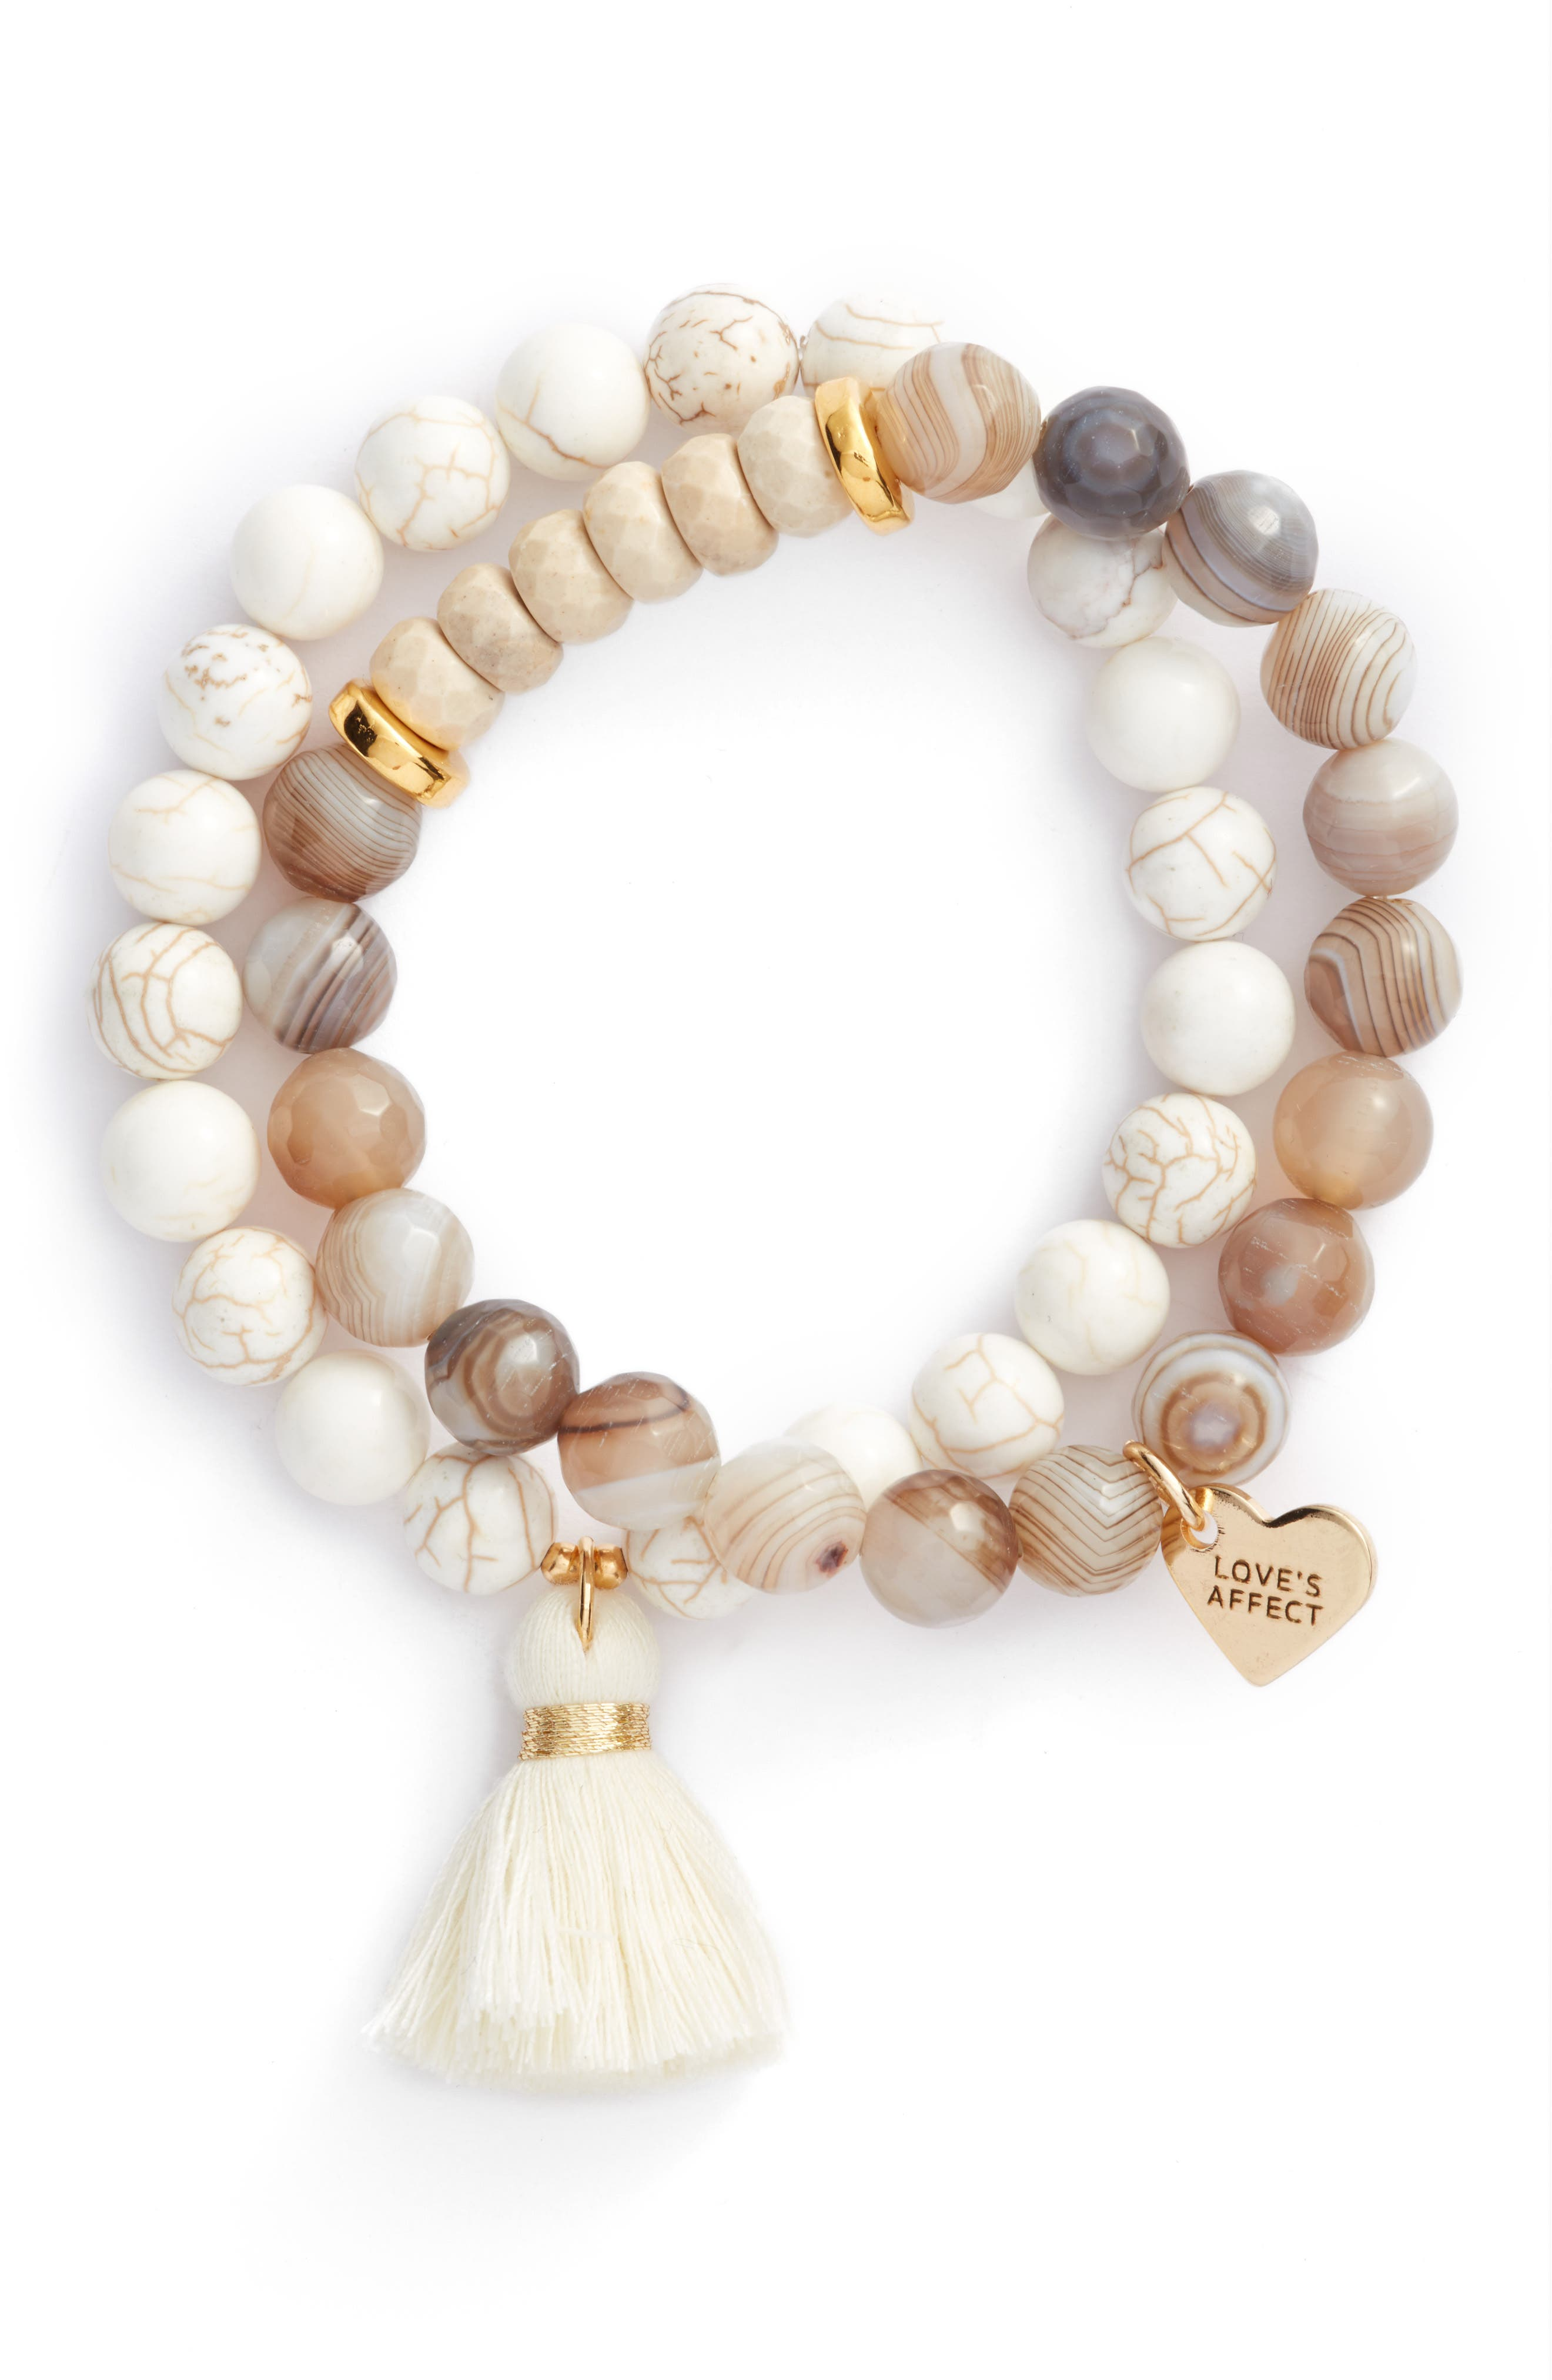 Alternate Image 1 Selected - Love's Affect Set of 2 Semiprecious Stone Tassel Bracelets